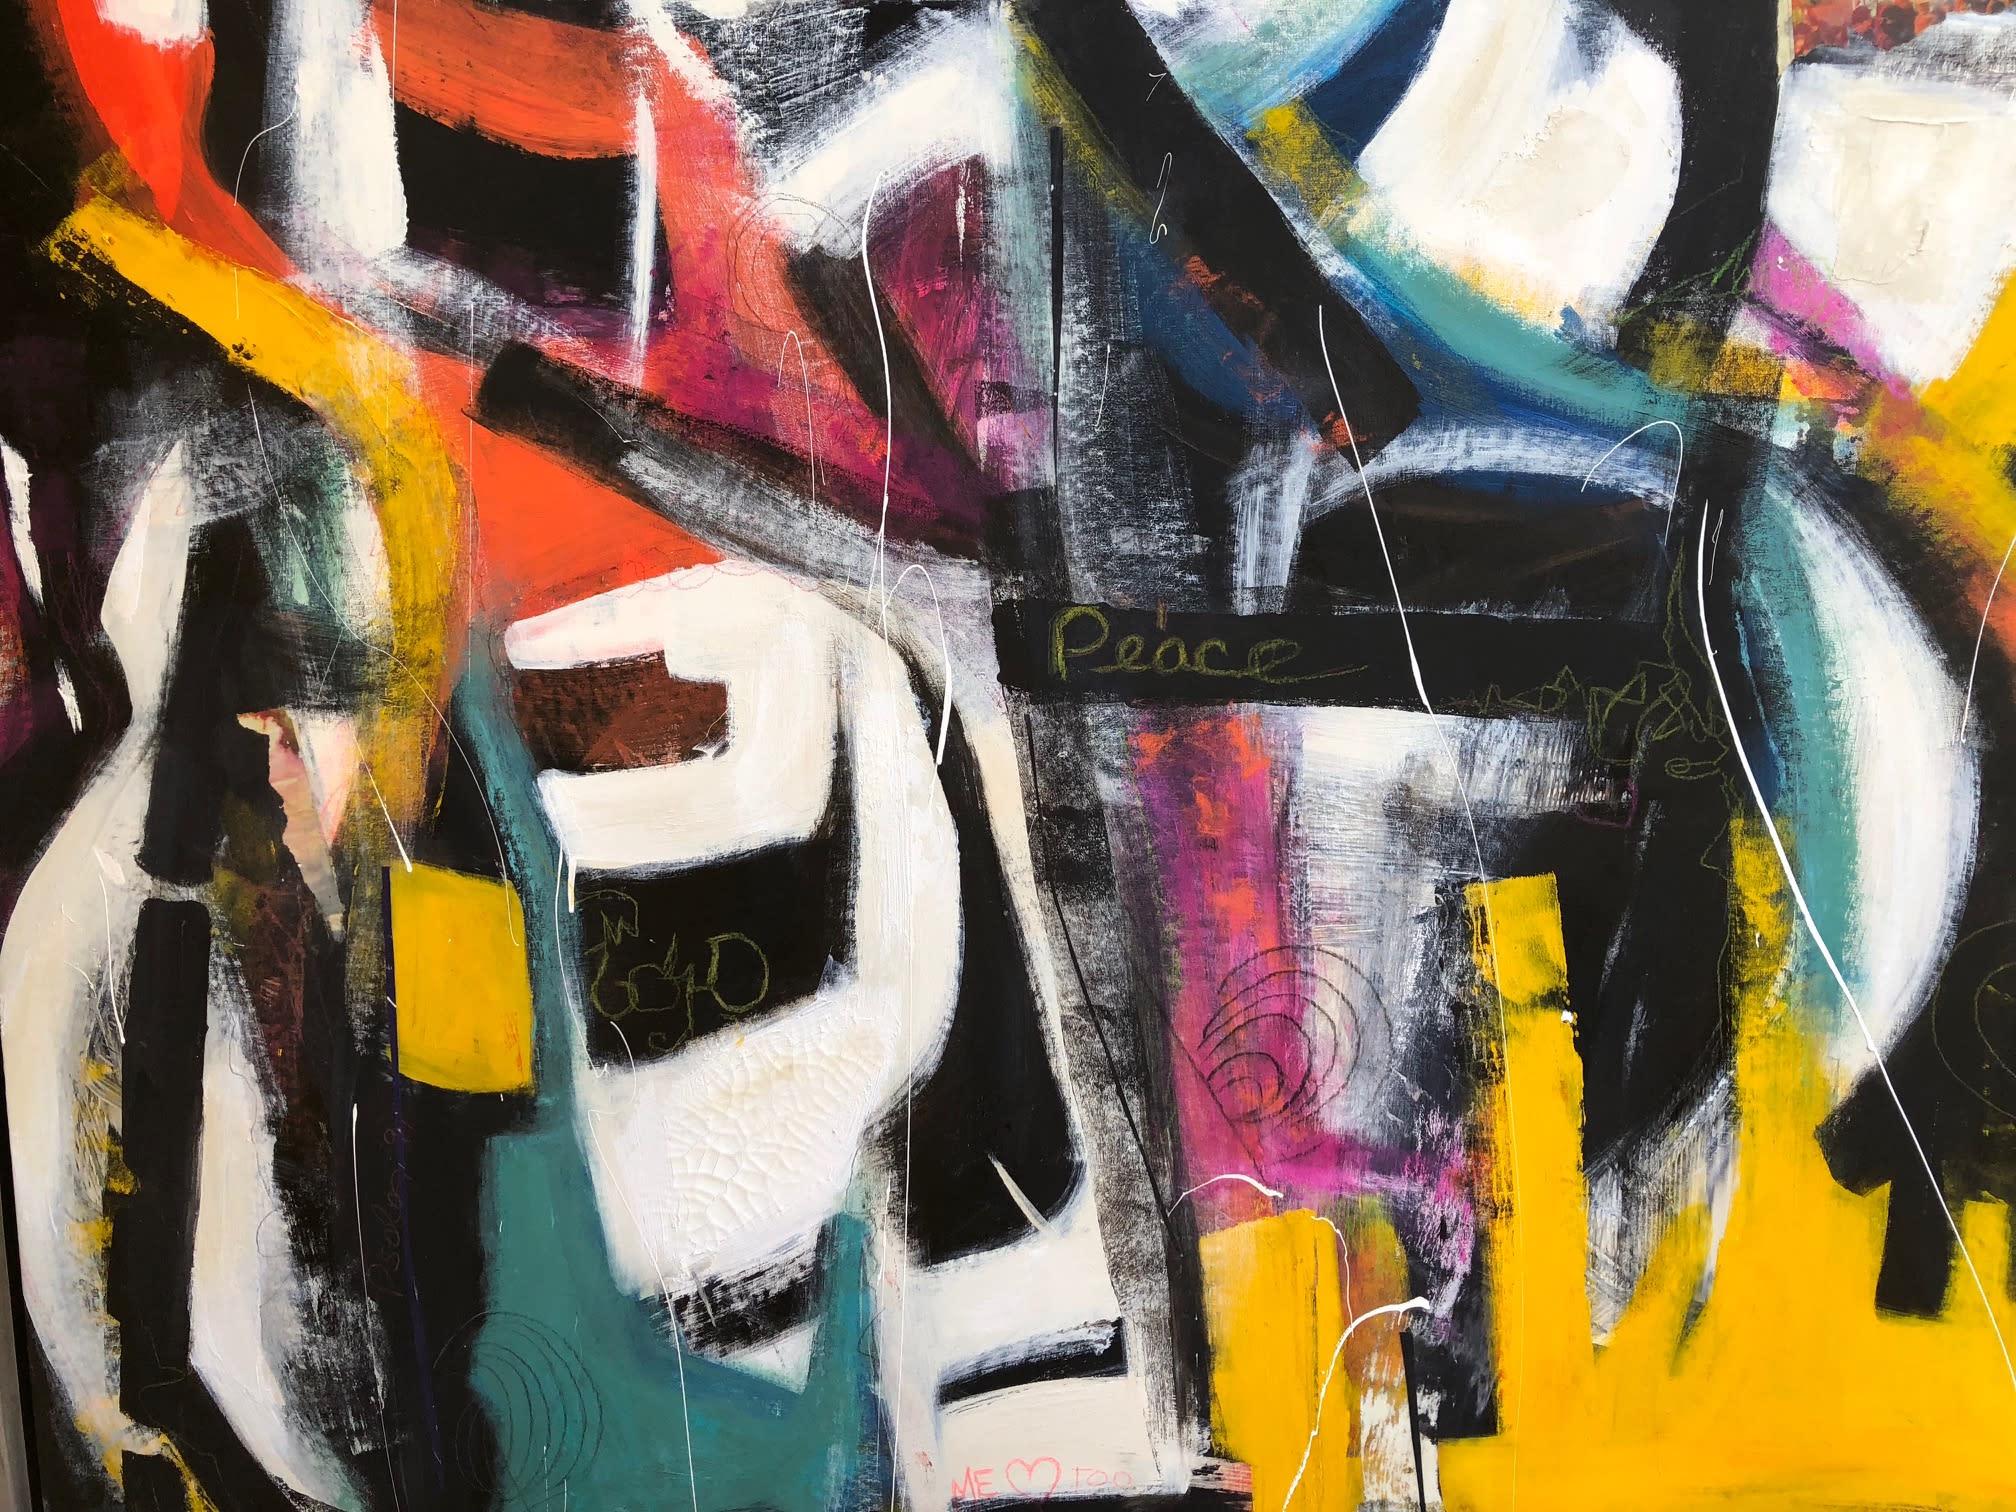 Deveuvealexis shoutout for peace 50 x62 acrylic and mixed media vecgyp